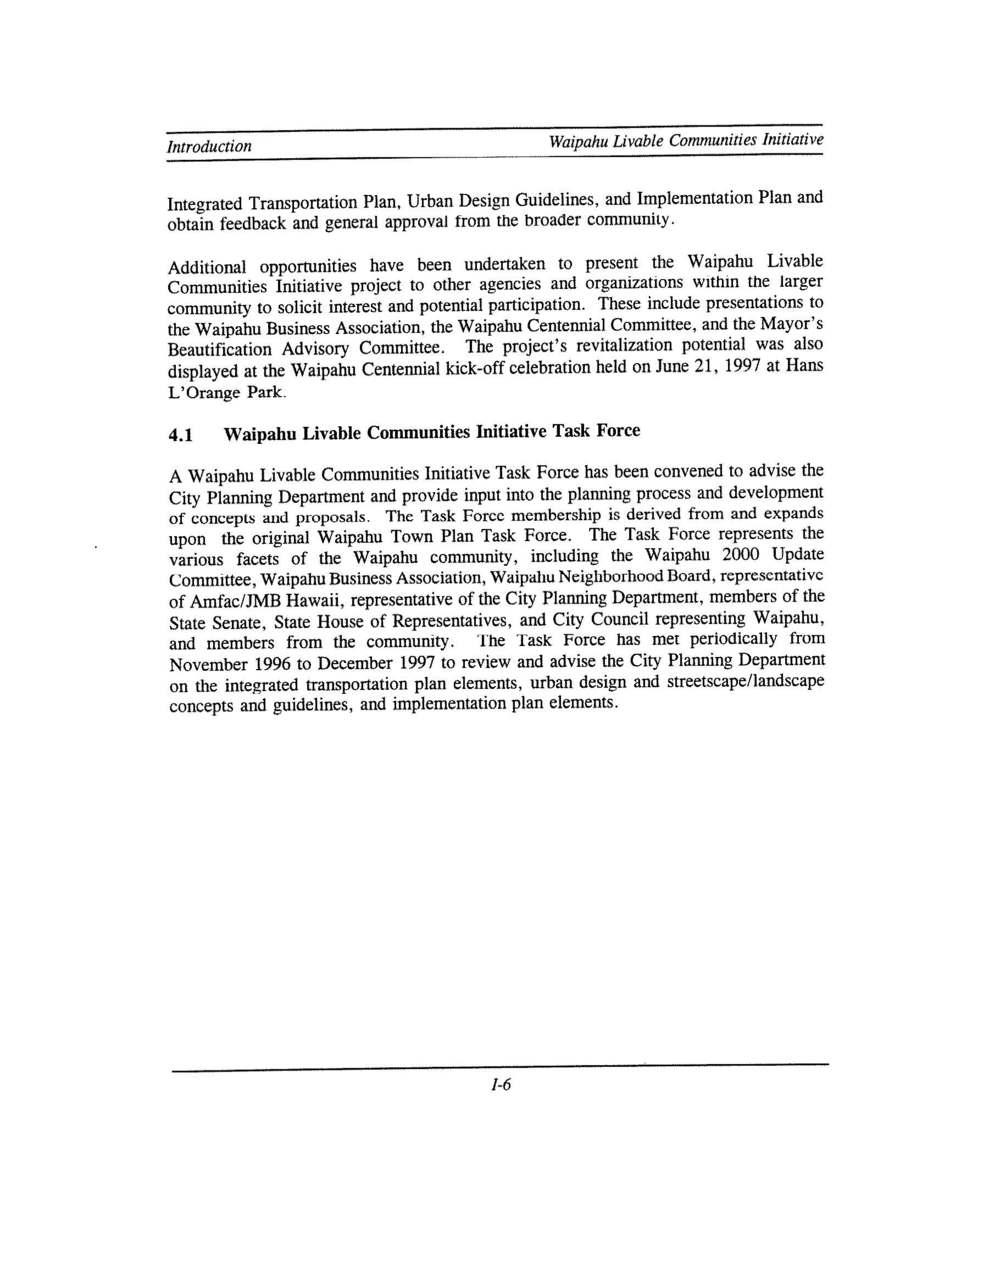 160531_WaipahuLivableCommunities(1998)_Page_014.jpg